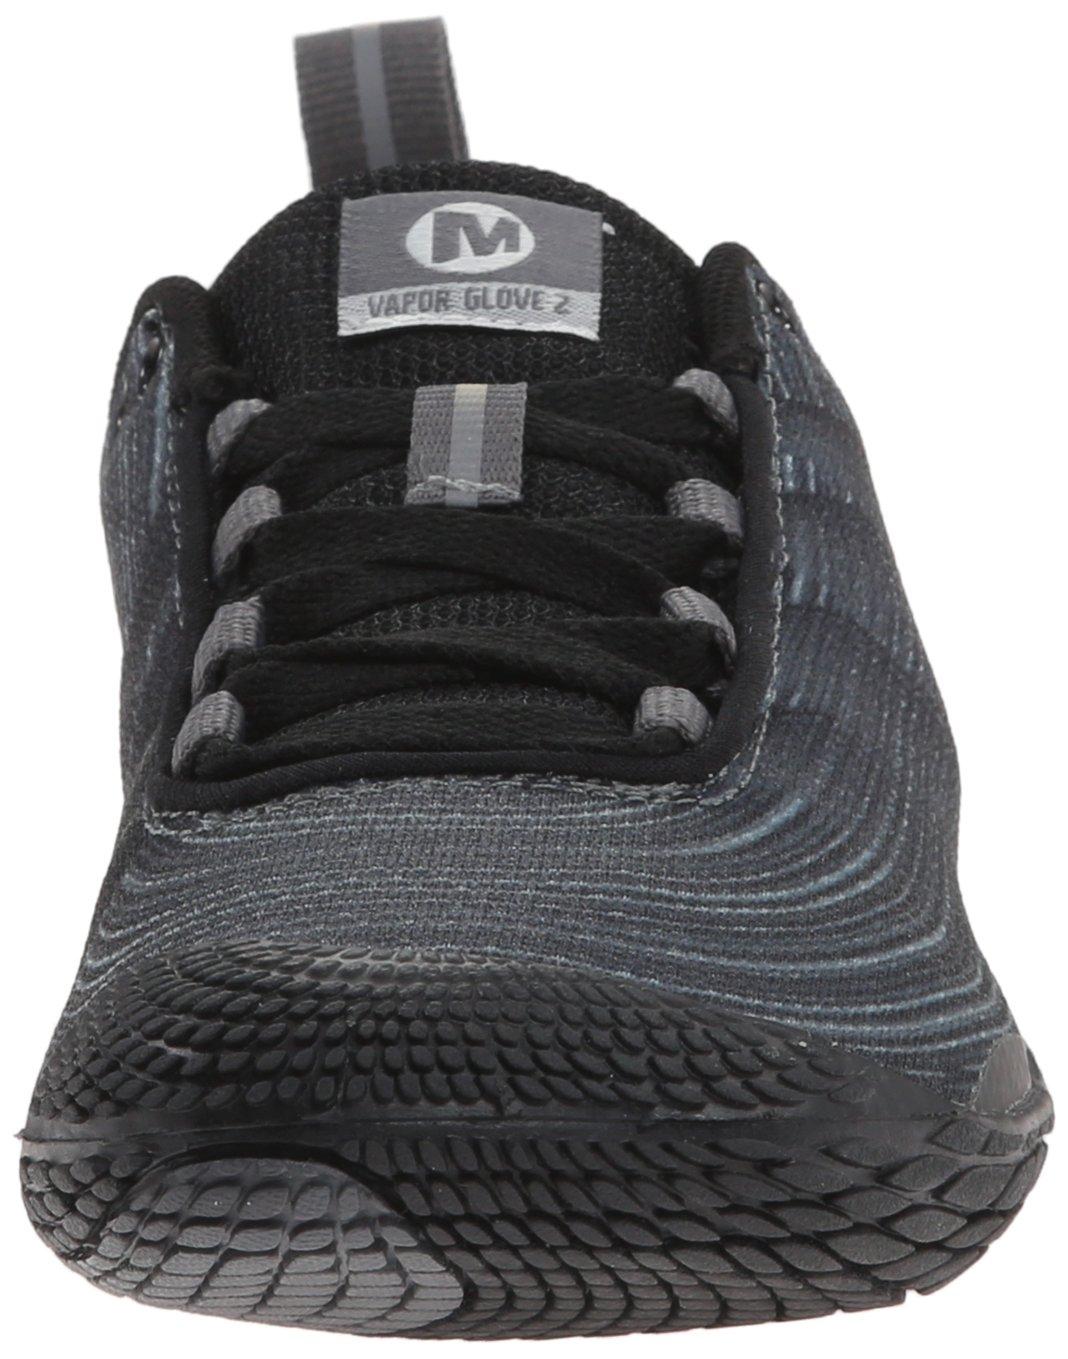 Merrell Women's Vapor Glove 2 Trail Running Shoe, Black/Castle Rock, 6 M US by Merrell (Image #4)